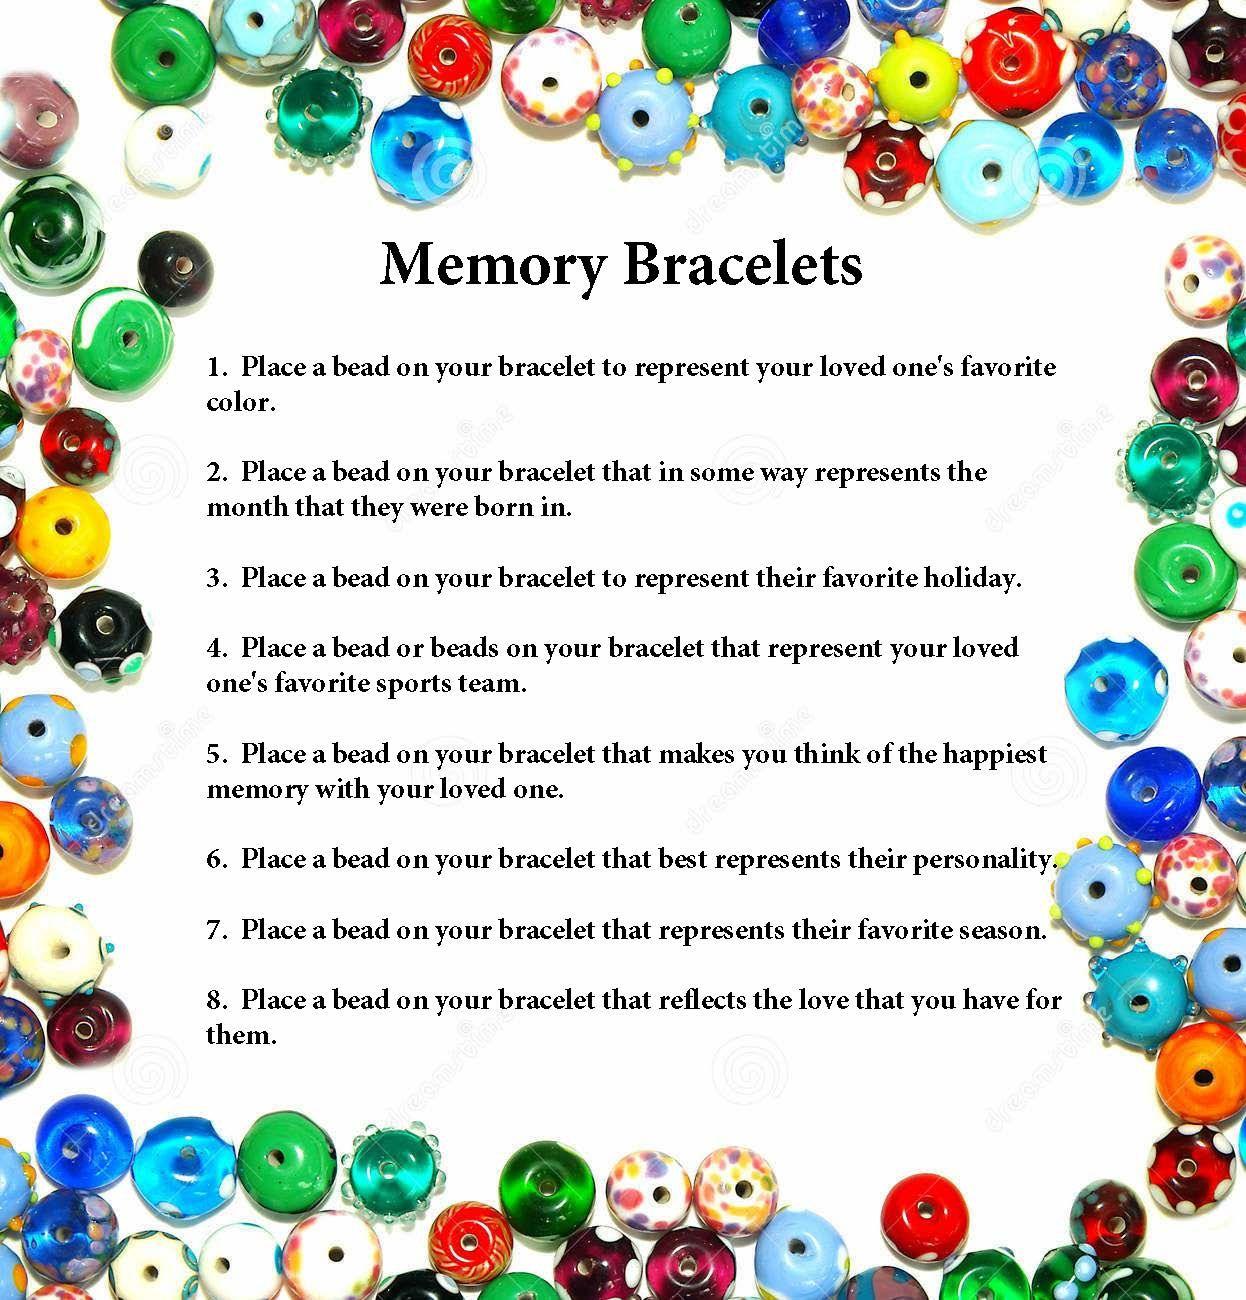 Memory Bracelets For Grieving